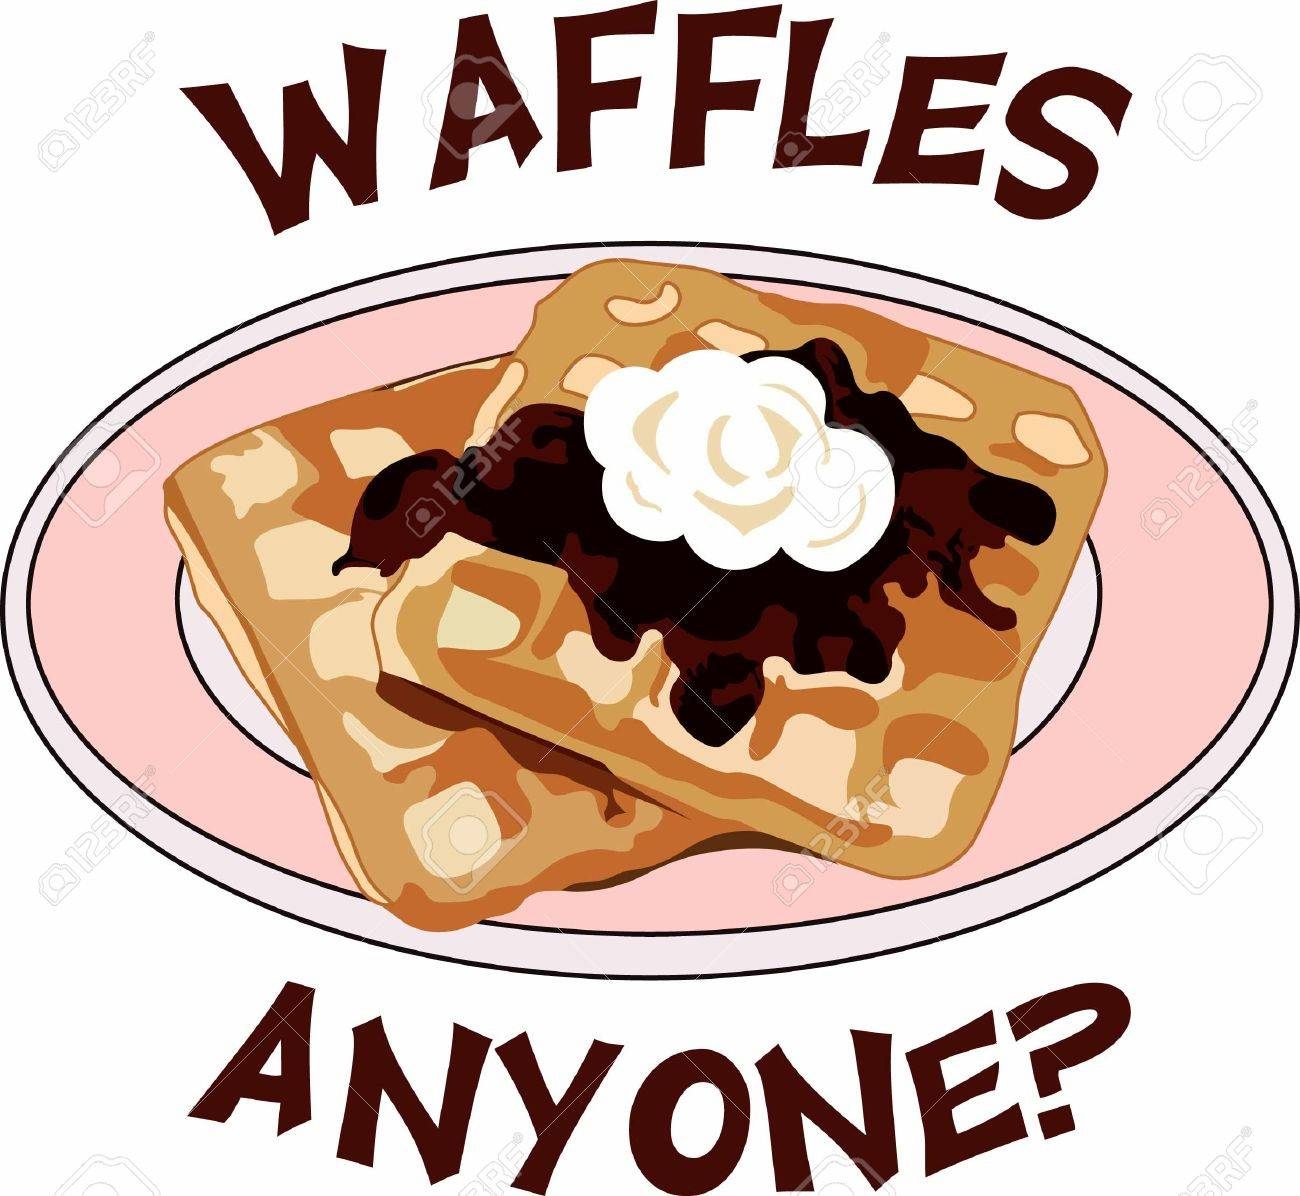 Waffle clipart border. Breakfast portal